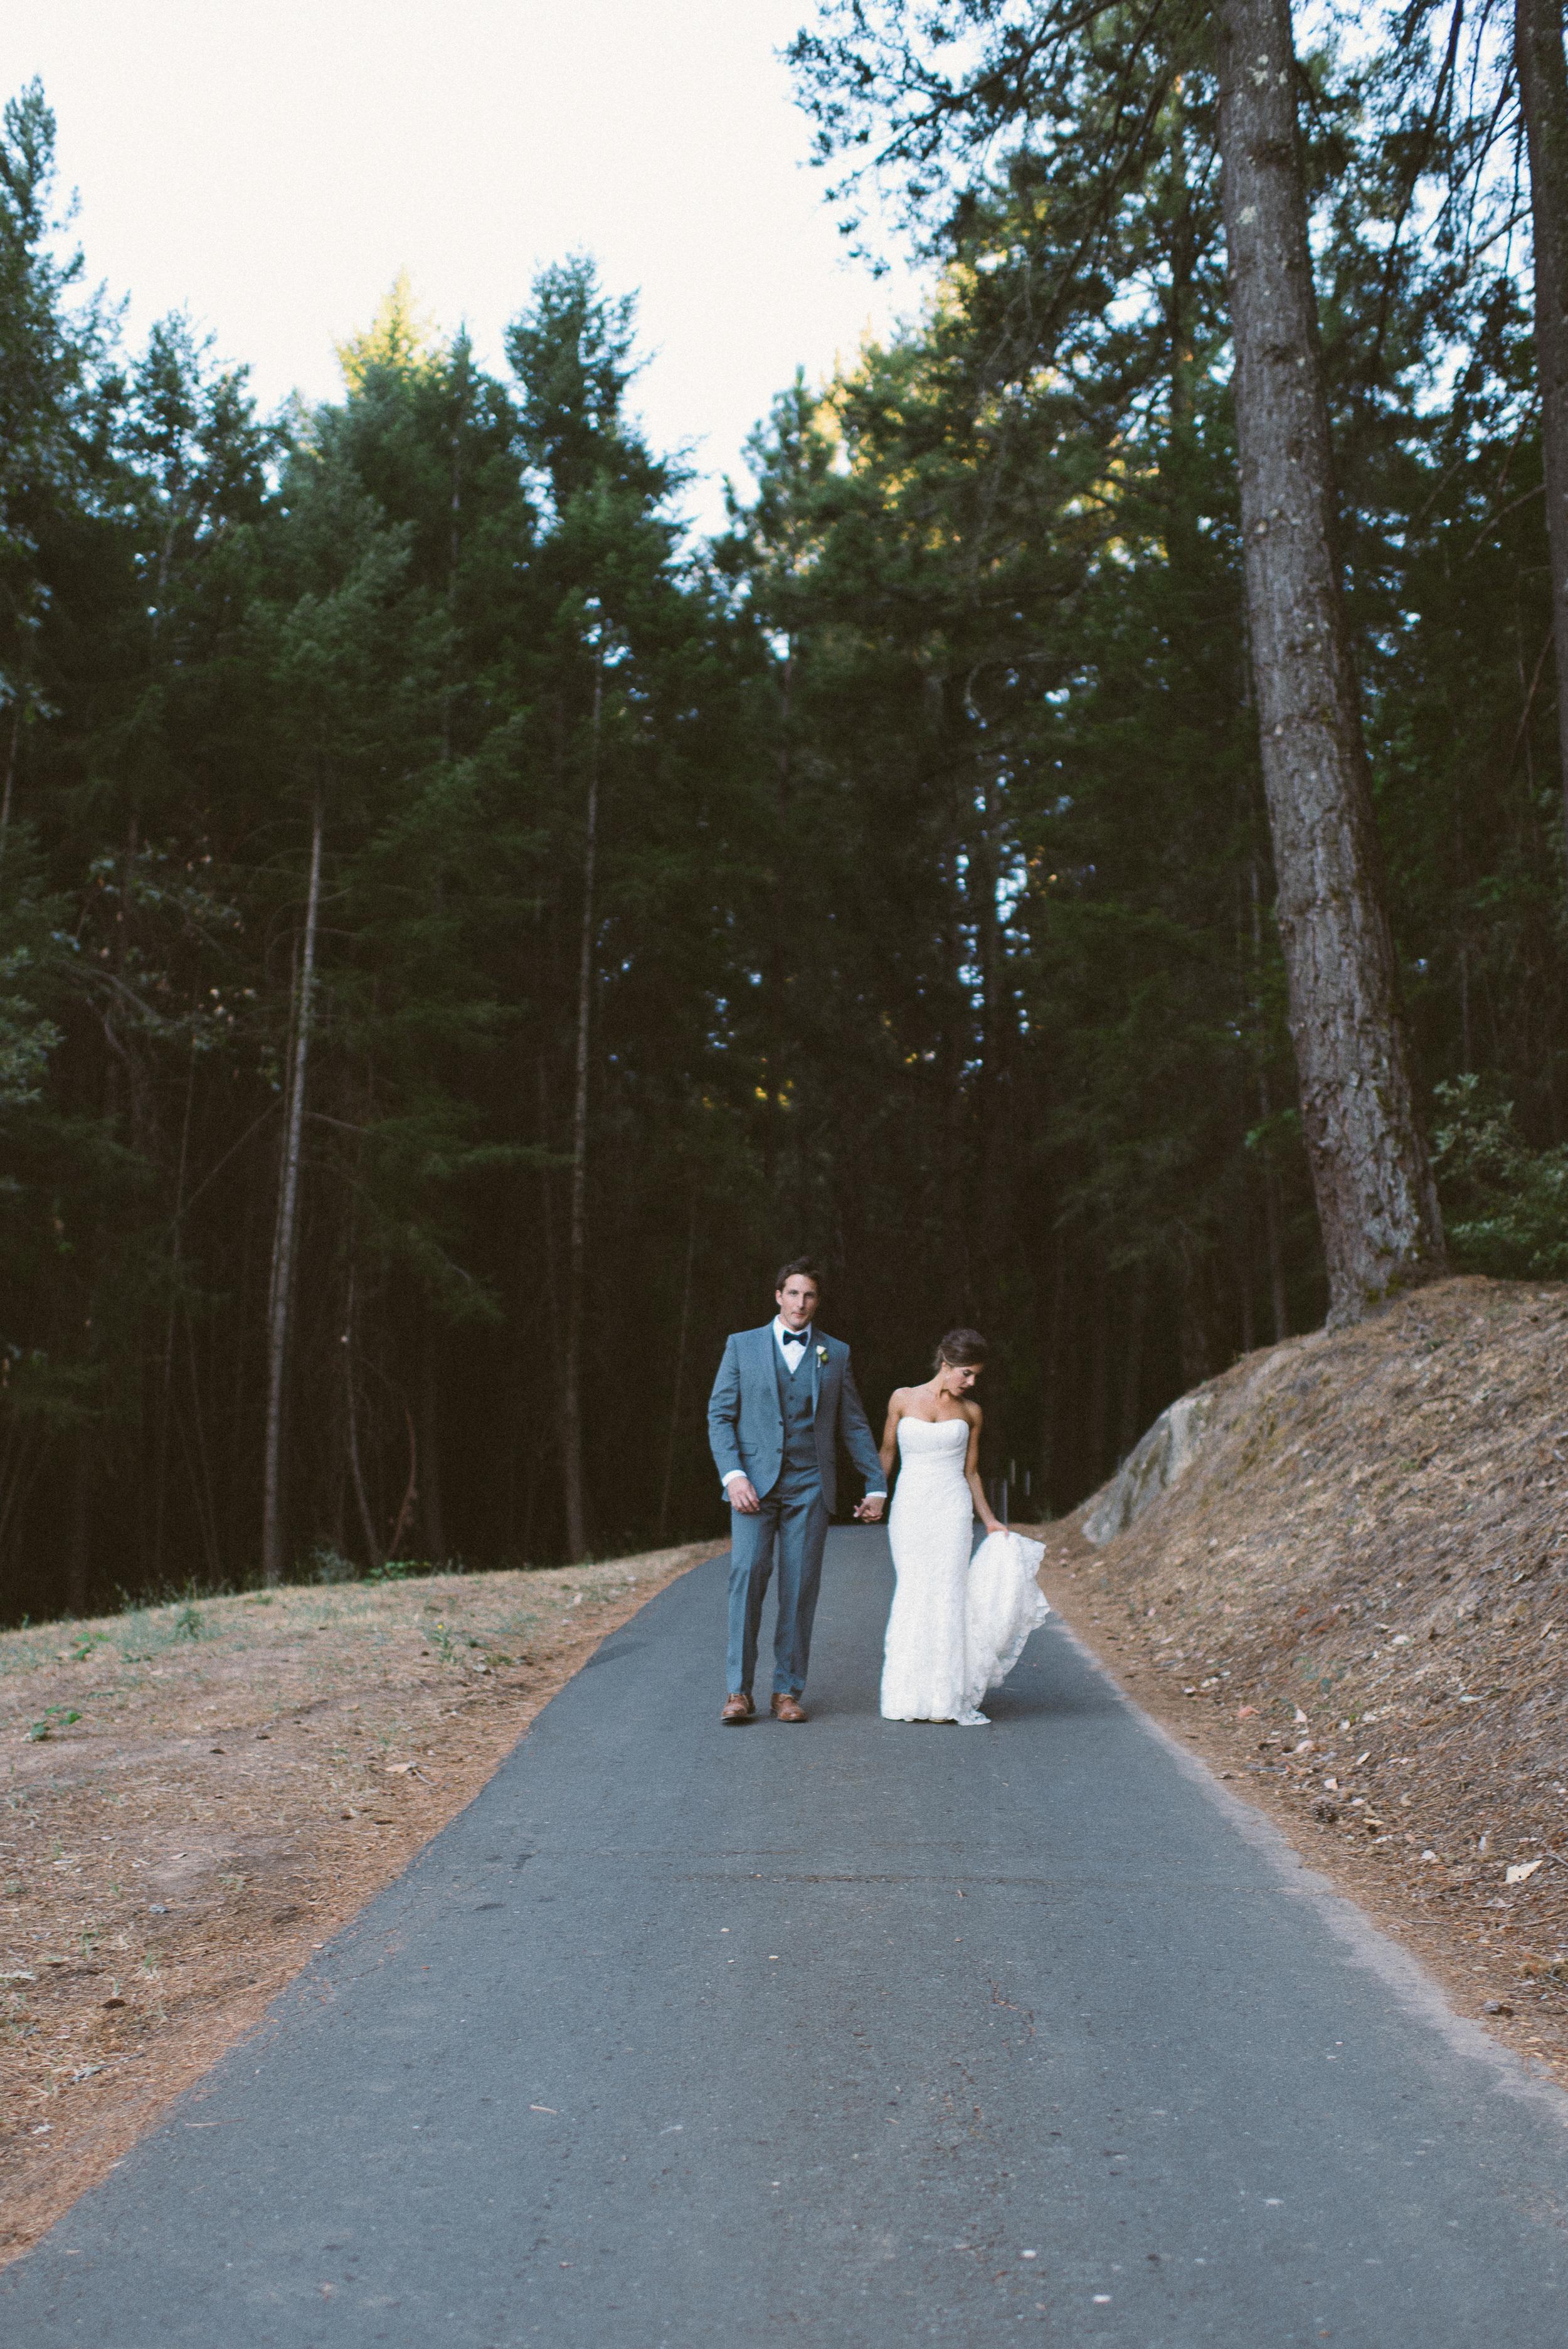 m-newsom-photography-chris-and-kim-napa-valley-wedding-savannah-georgia-wedding-photographer (976 of 1586).jpg